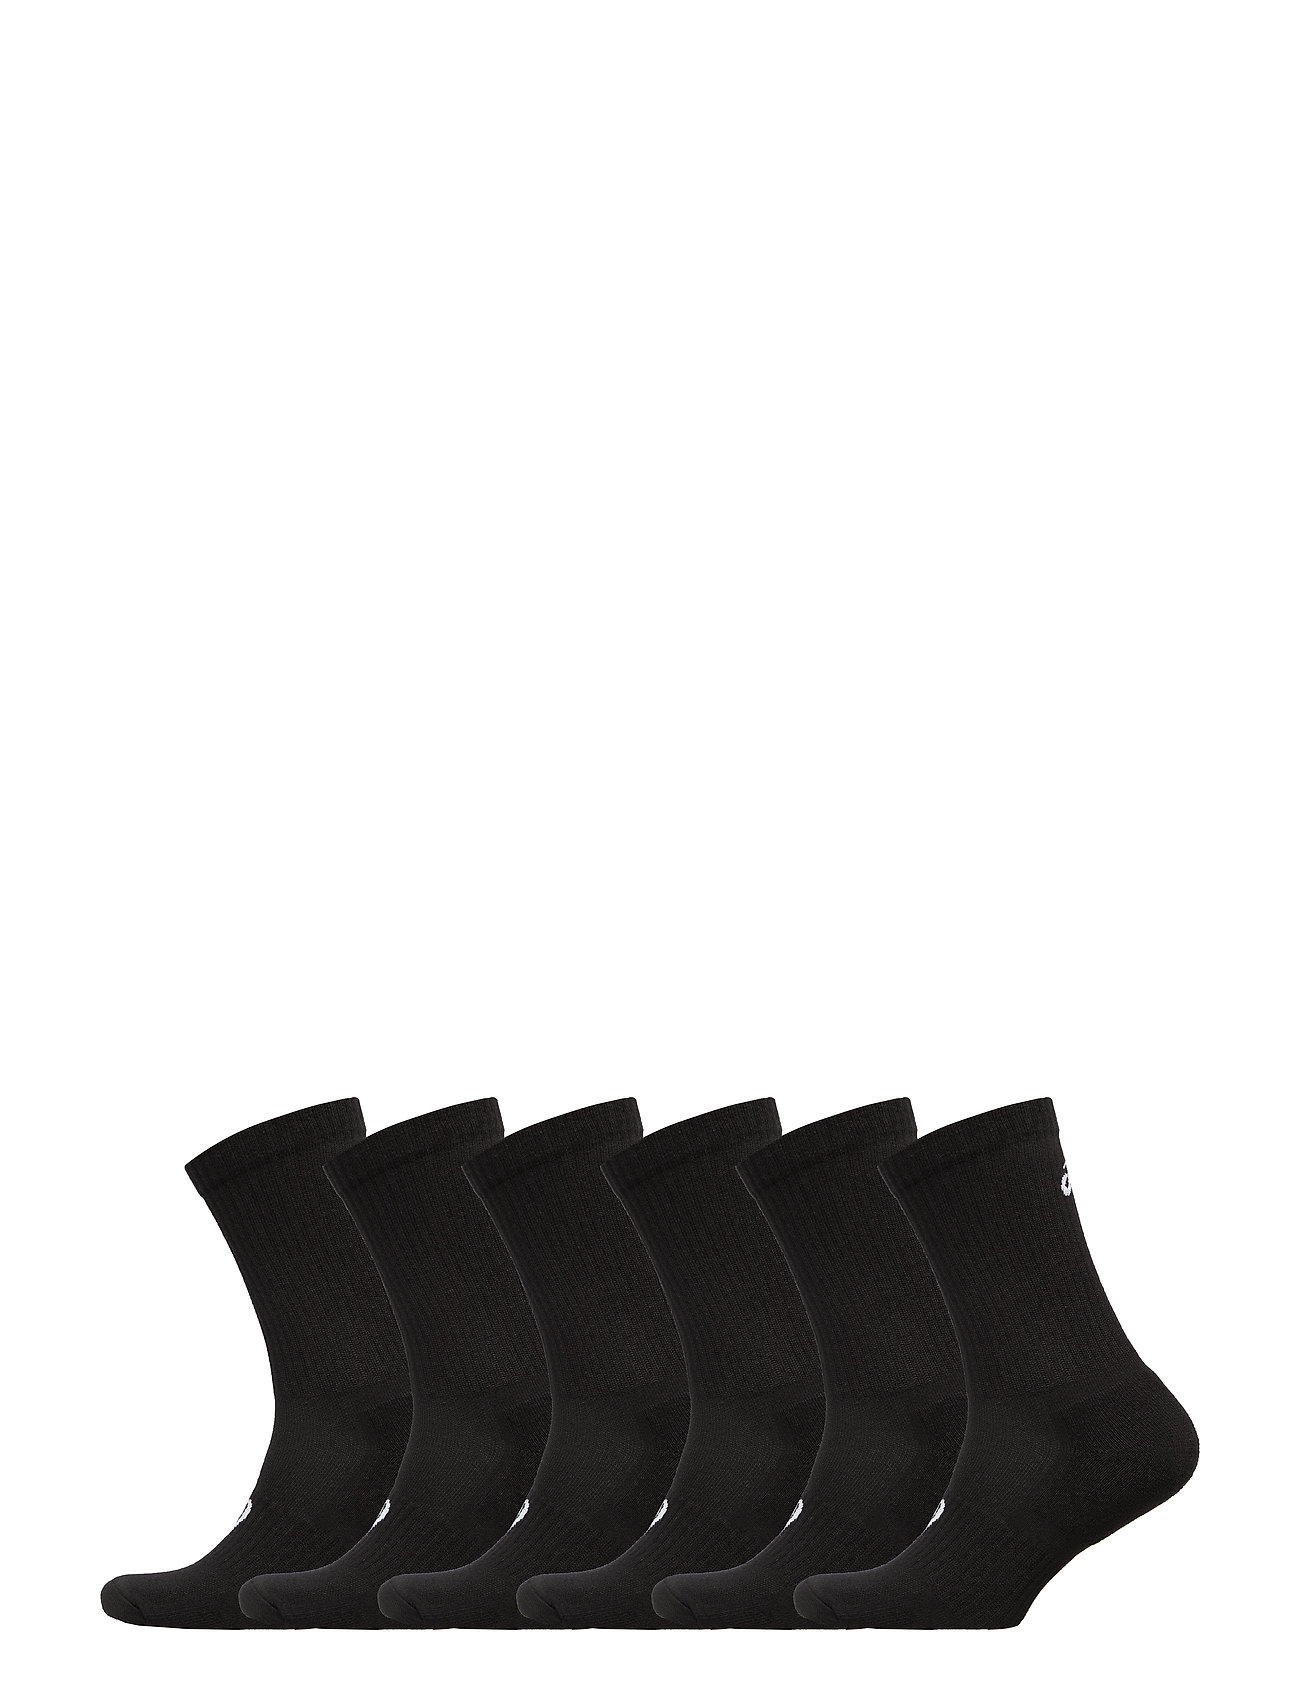 Asics 6PKK CREW SOCK - PERFORMANCE BLACK